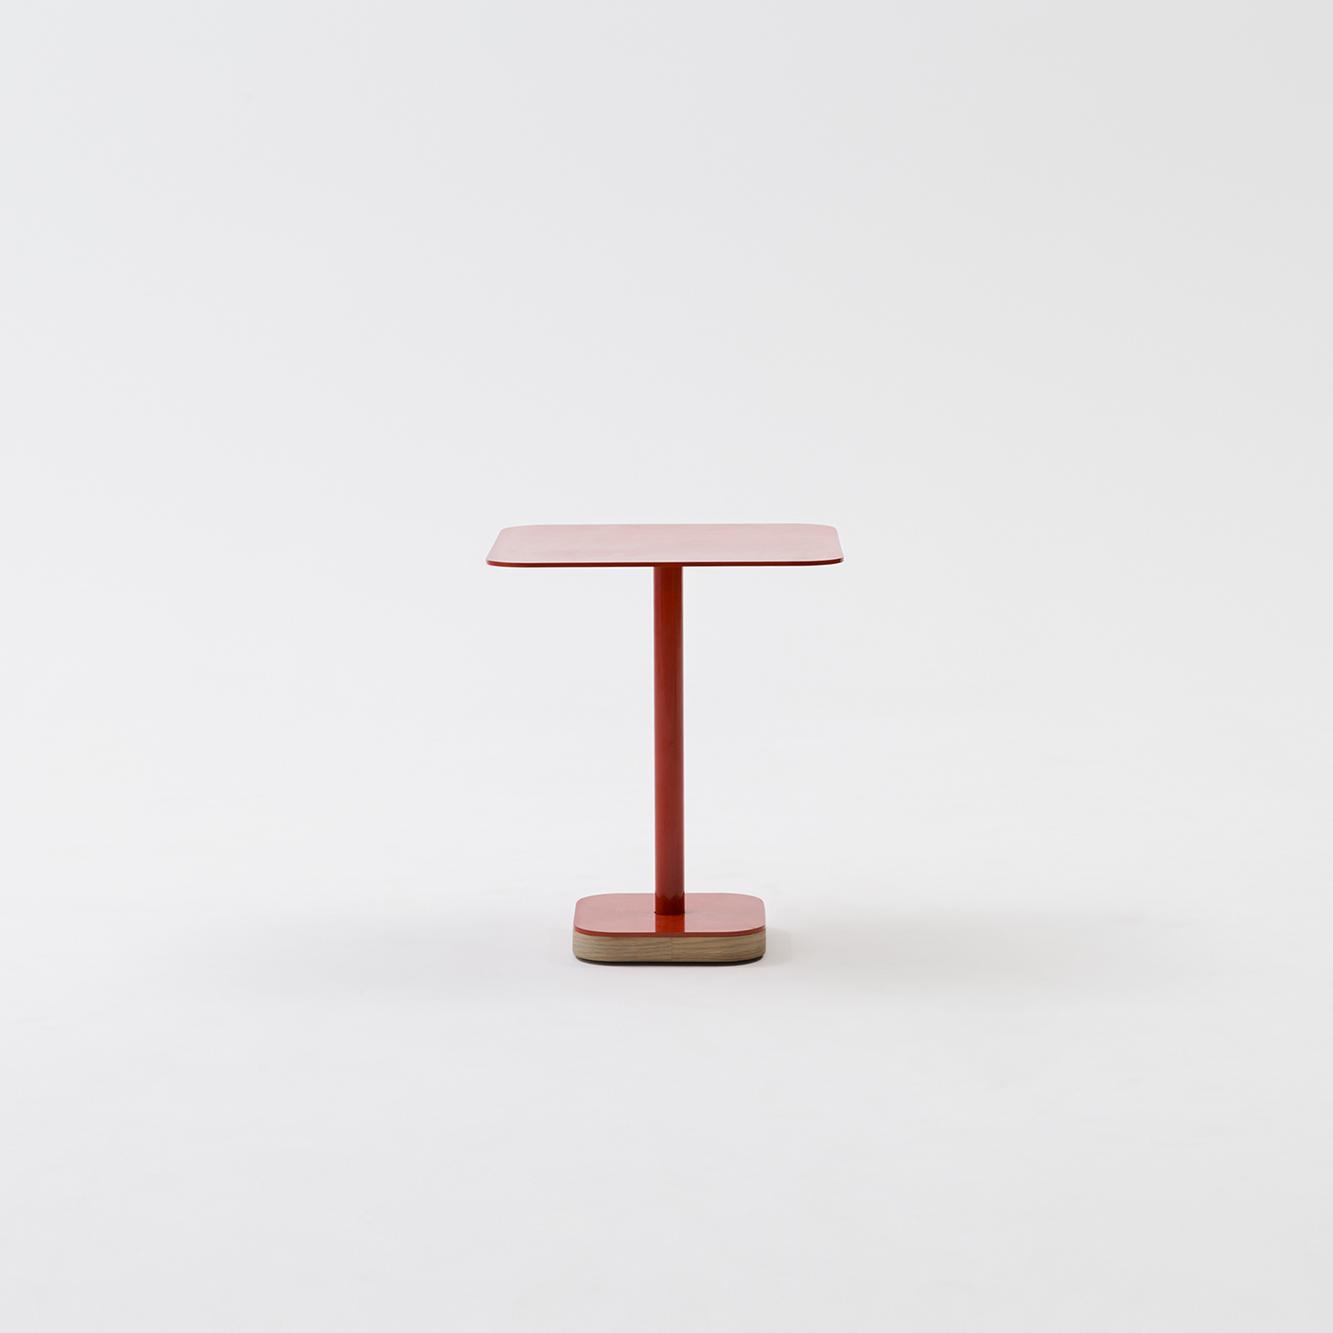 Jardan_Boney_Low-Table_1.jpg